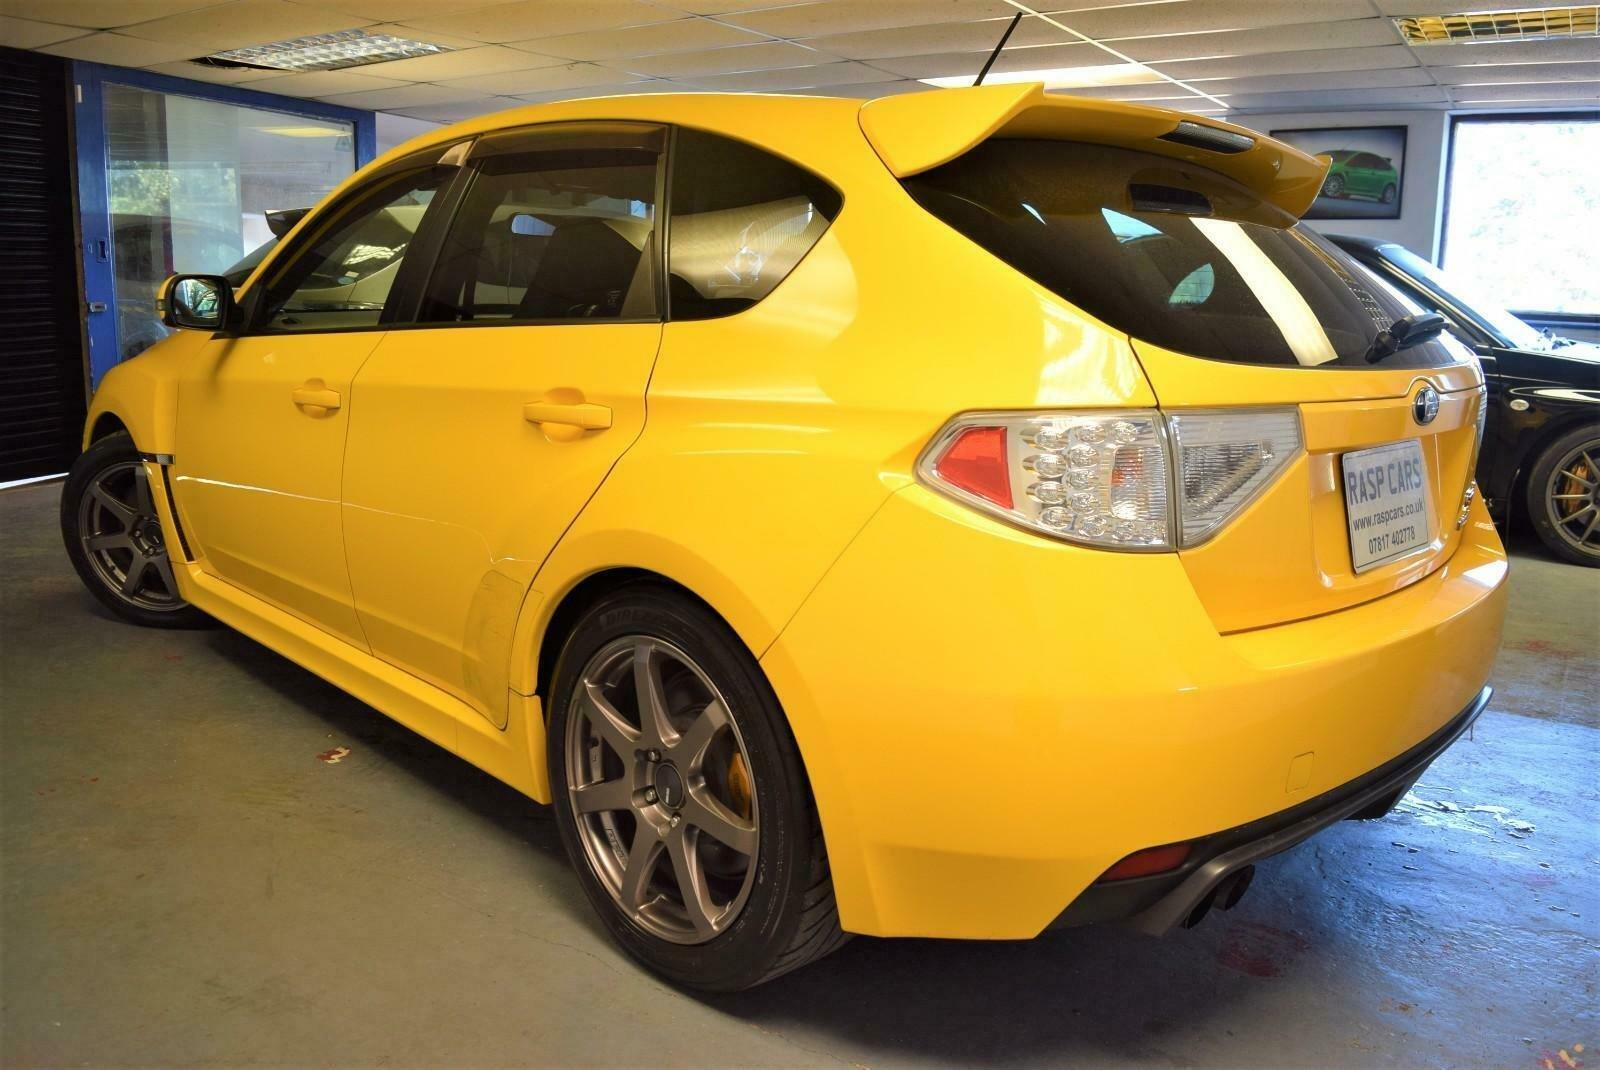 2009 Subaru Impreza 2.0 WRX STi Spec-C JDM Import Model For Sale (picture 7 of 12)